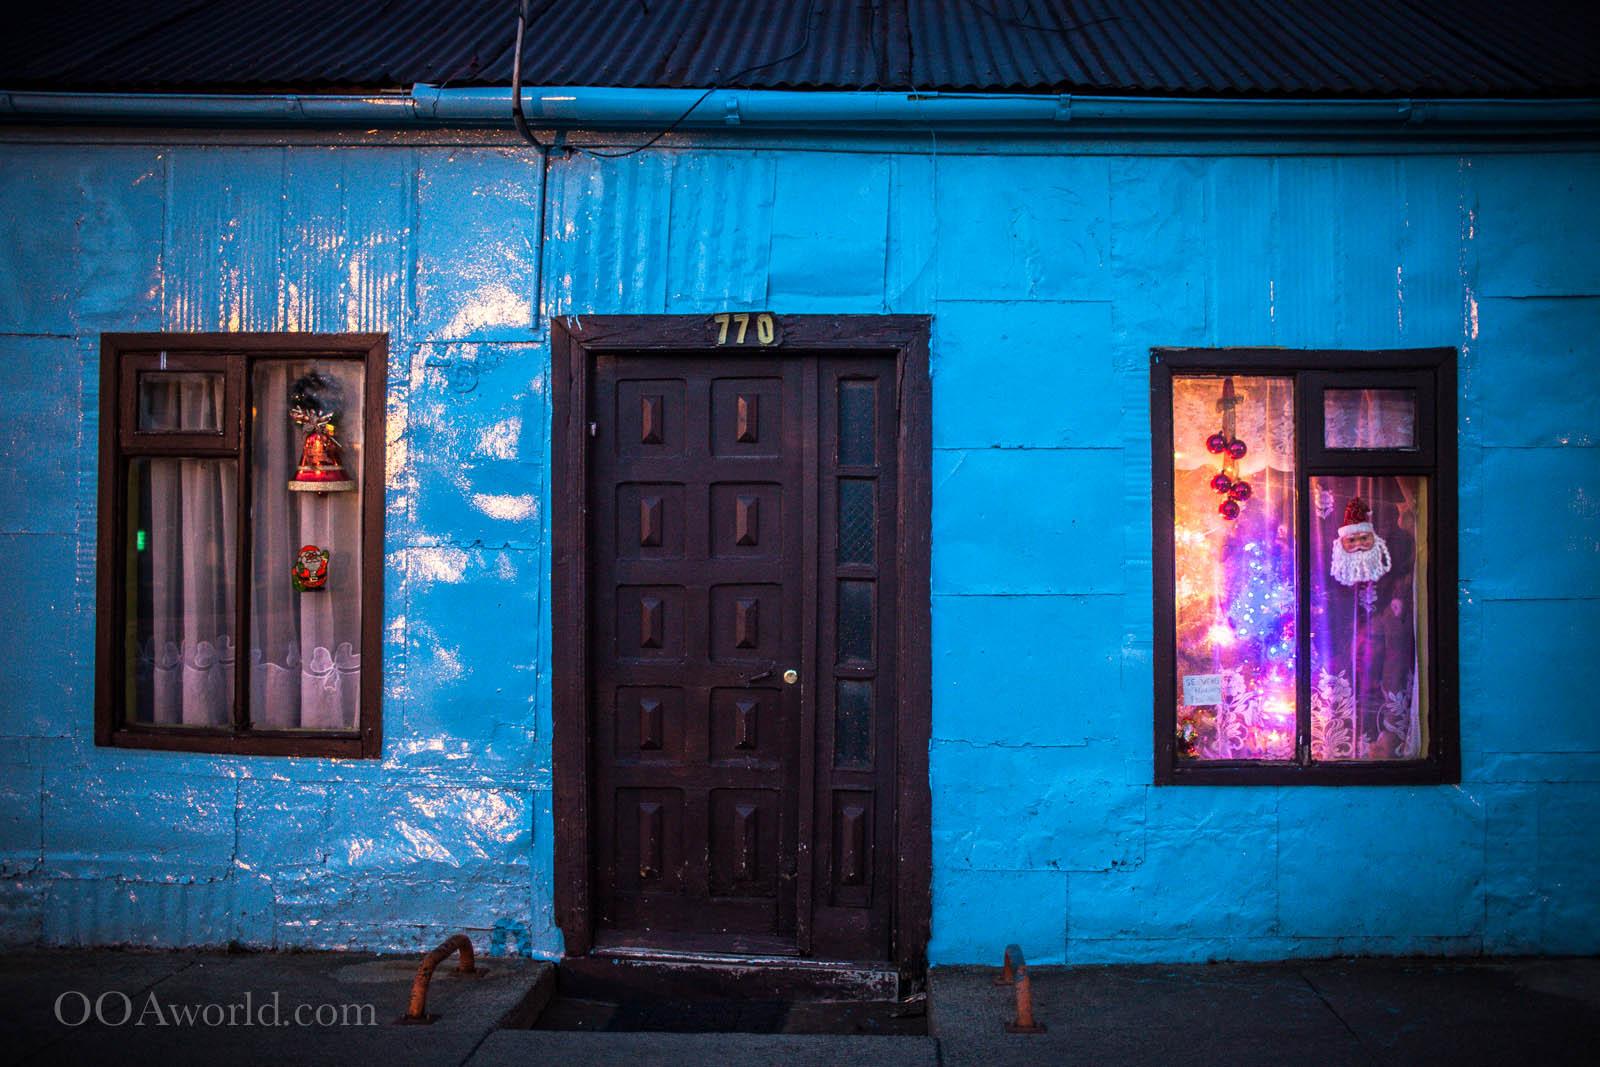 Puerto Natales Blue Dreams Photo Ooaworld